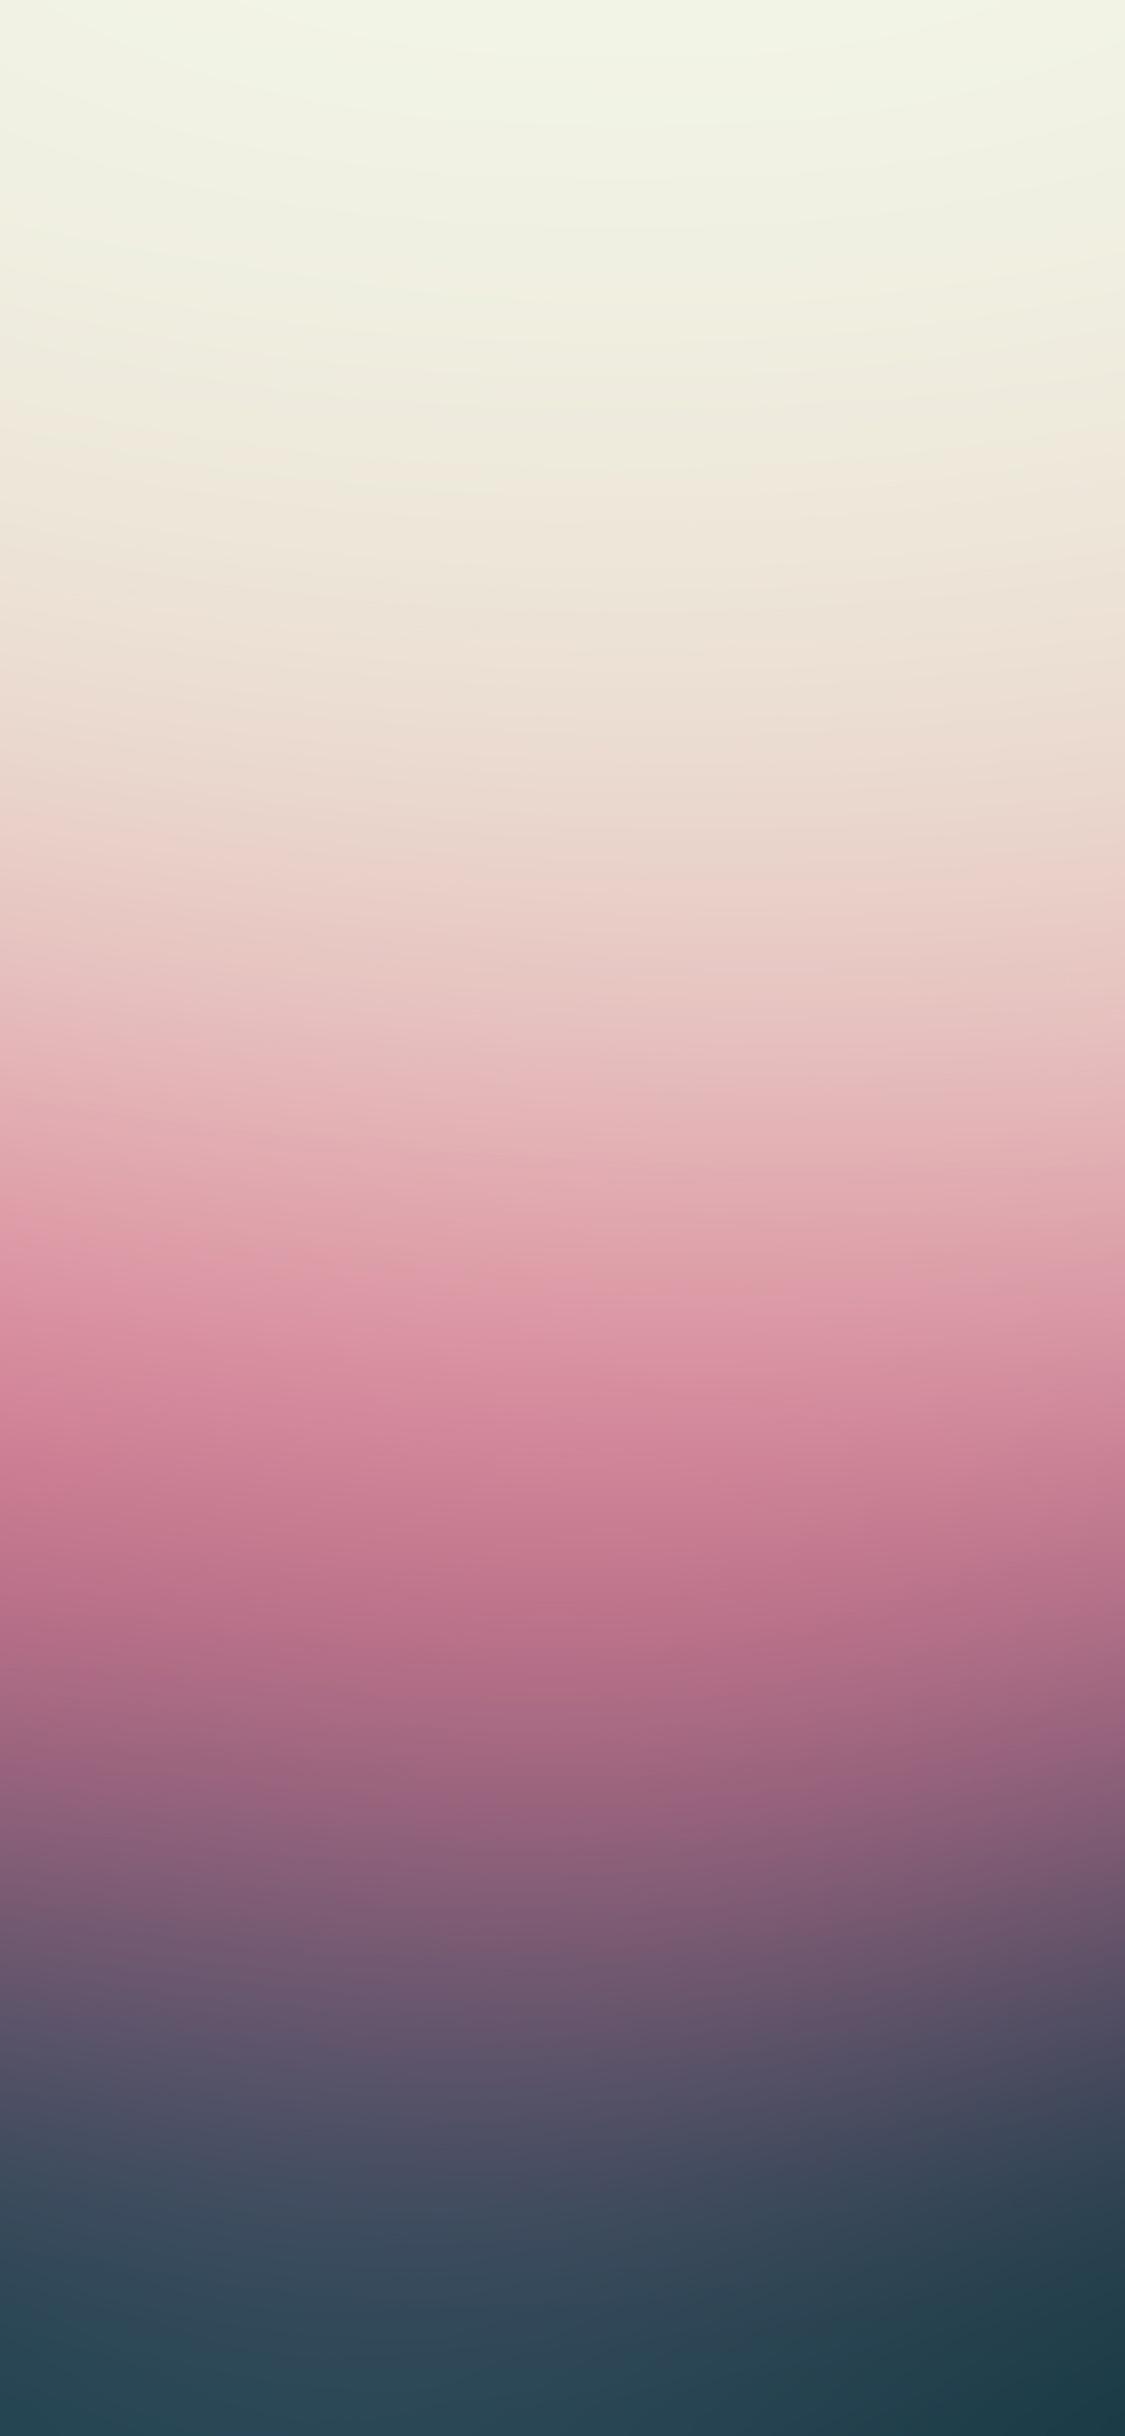 iPhoneXpapers.com-Apple-iPhone-wallpaper-sk81-pink-green-mountain-blur-gradation